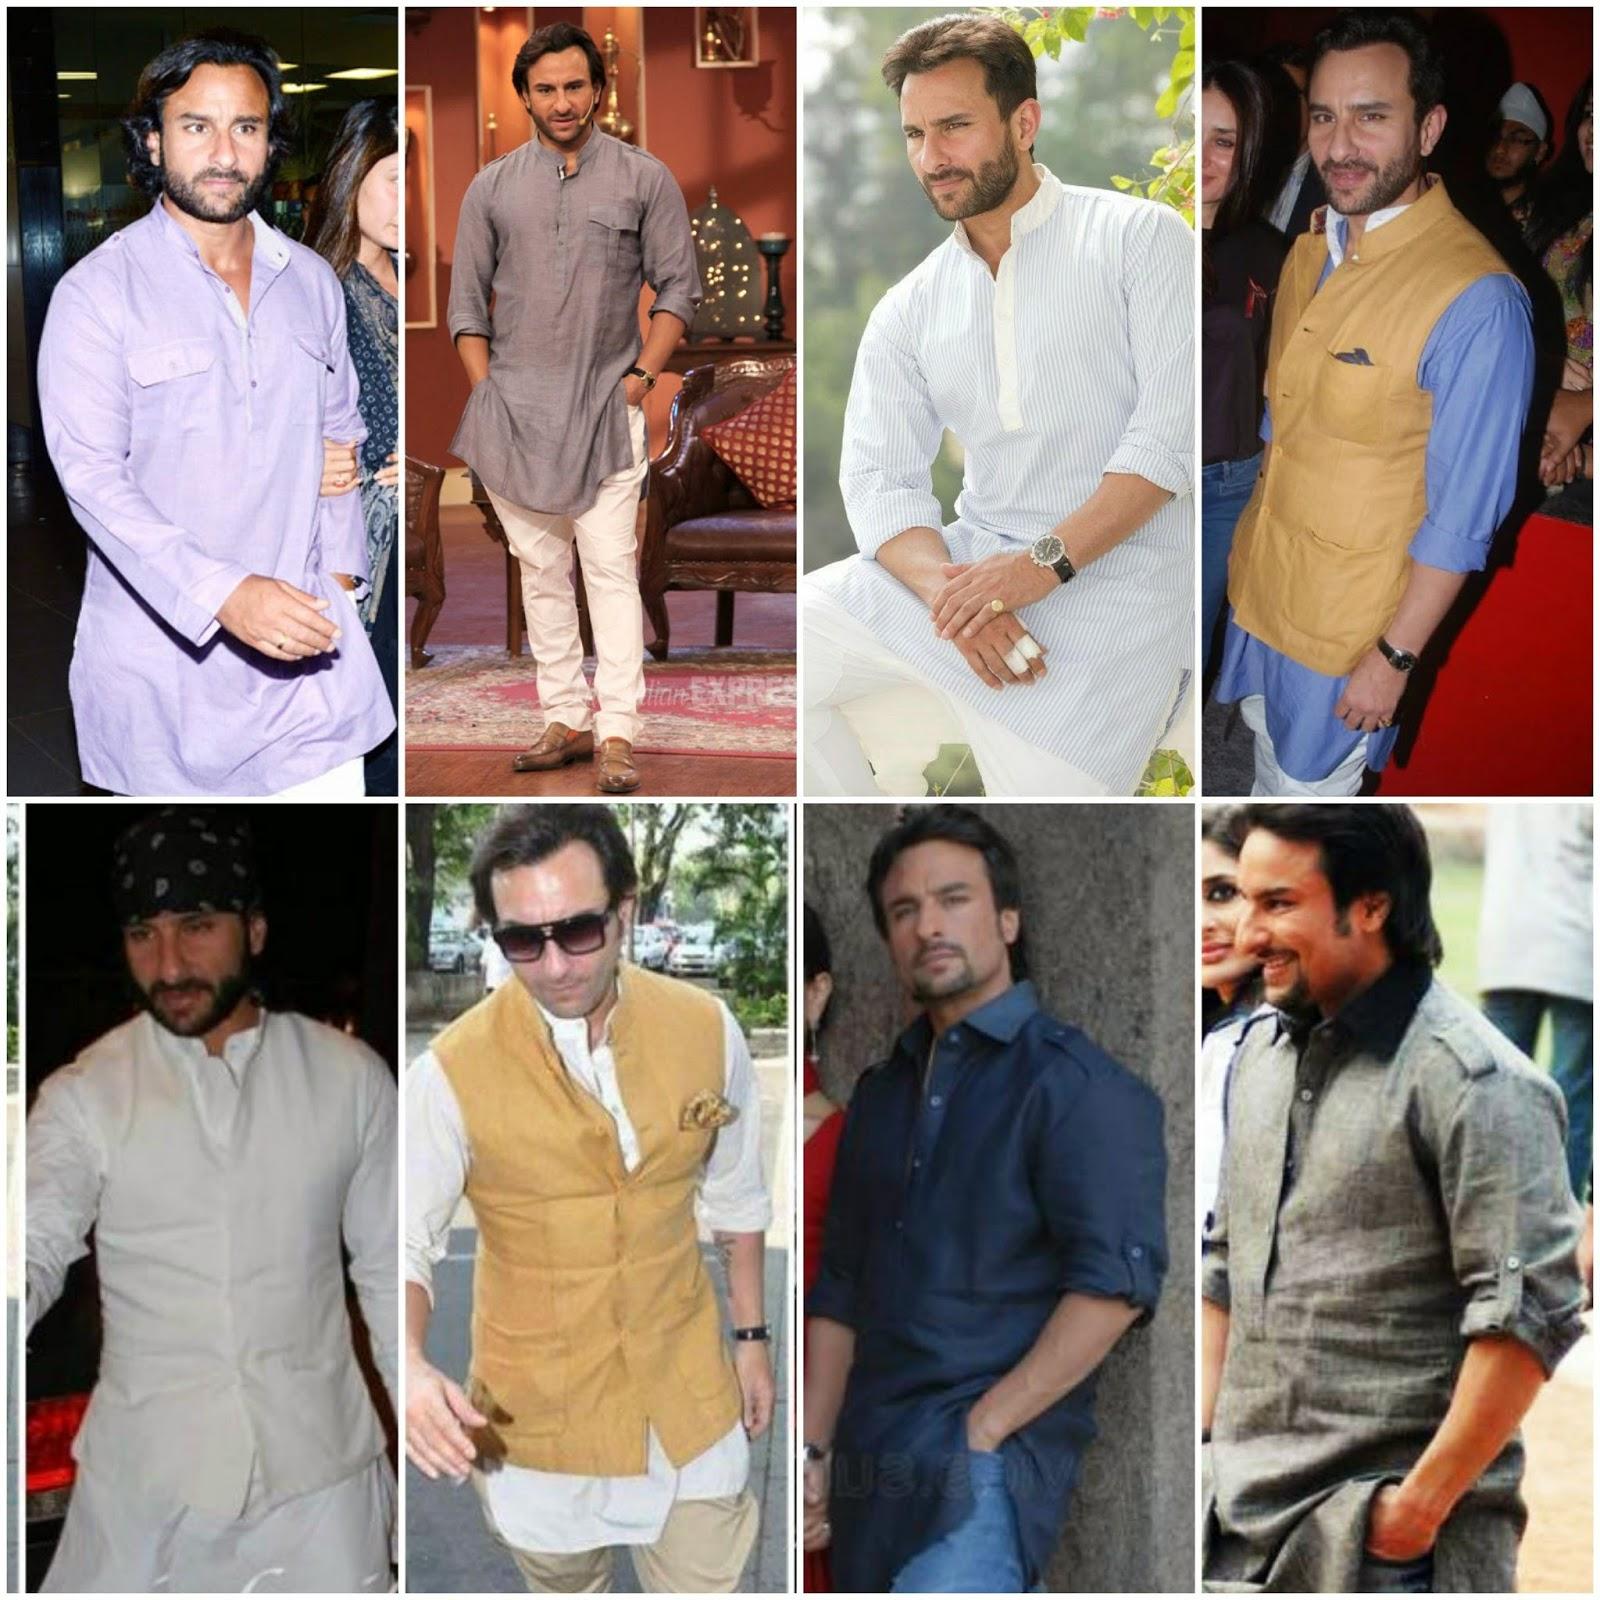 saif ali khan in kurta style , kurta style eid 2014, eid 2014, eid men wear kurta